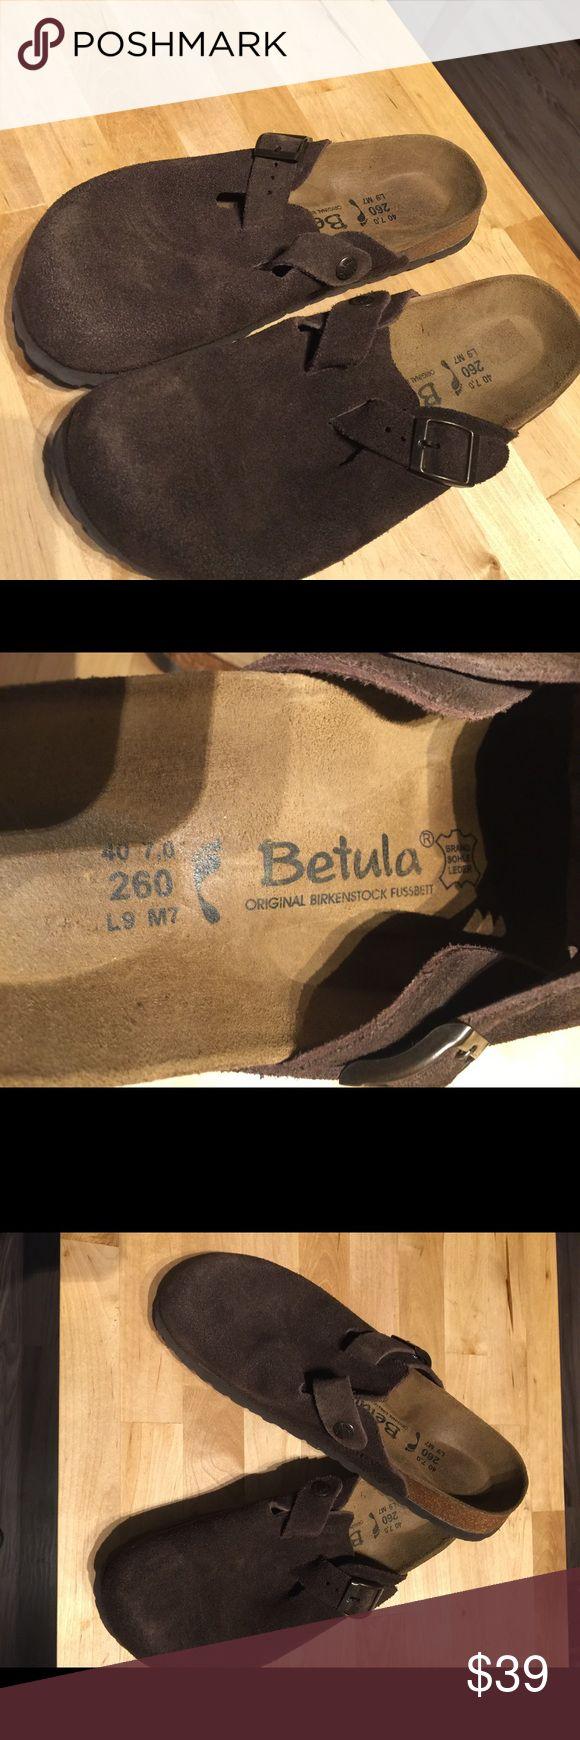 Brand NEW Birkenstock Betula suede sz7 slippers NEW not used Birkenstock slippers in soft suede sz7 Birkenstock Shoes Slippers